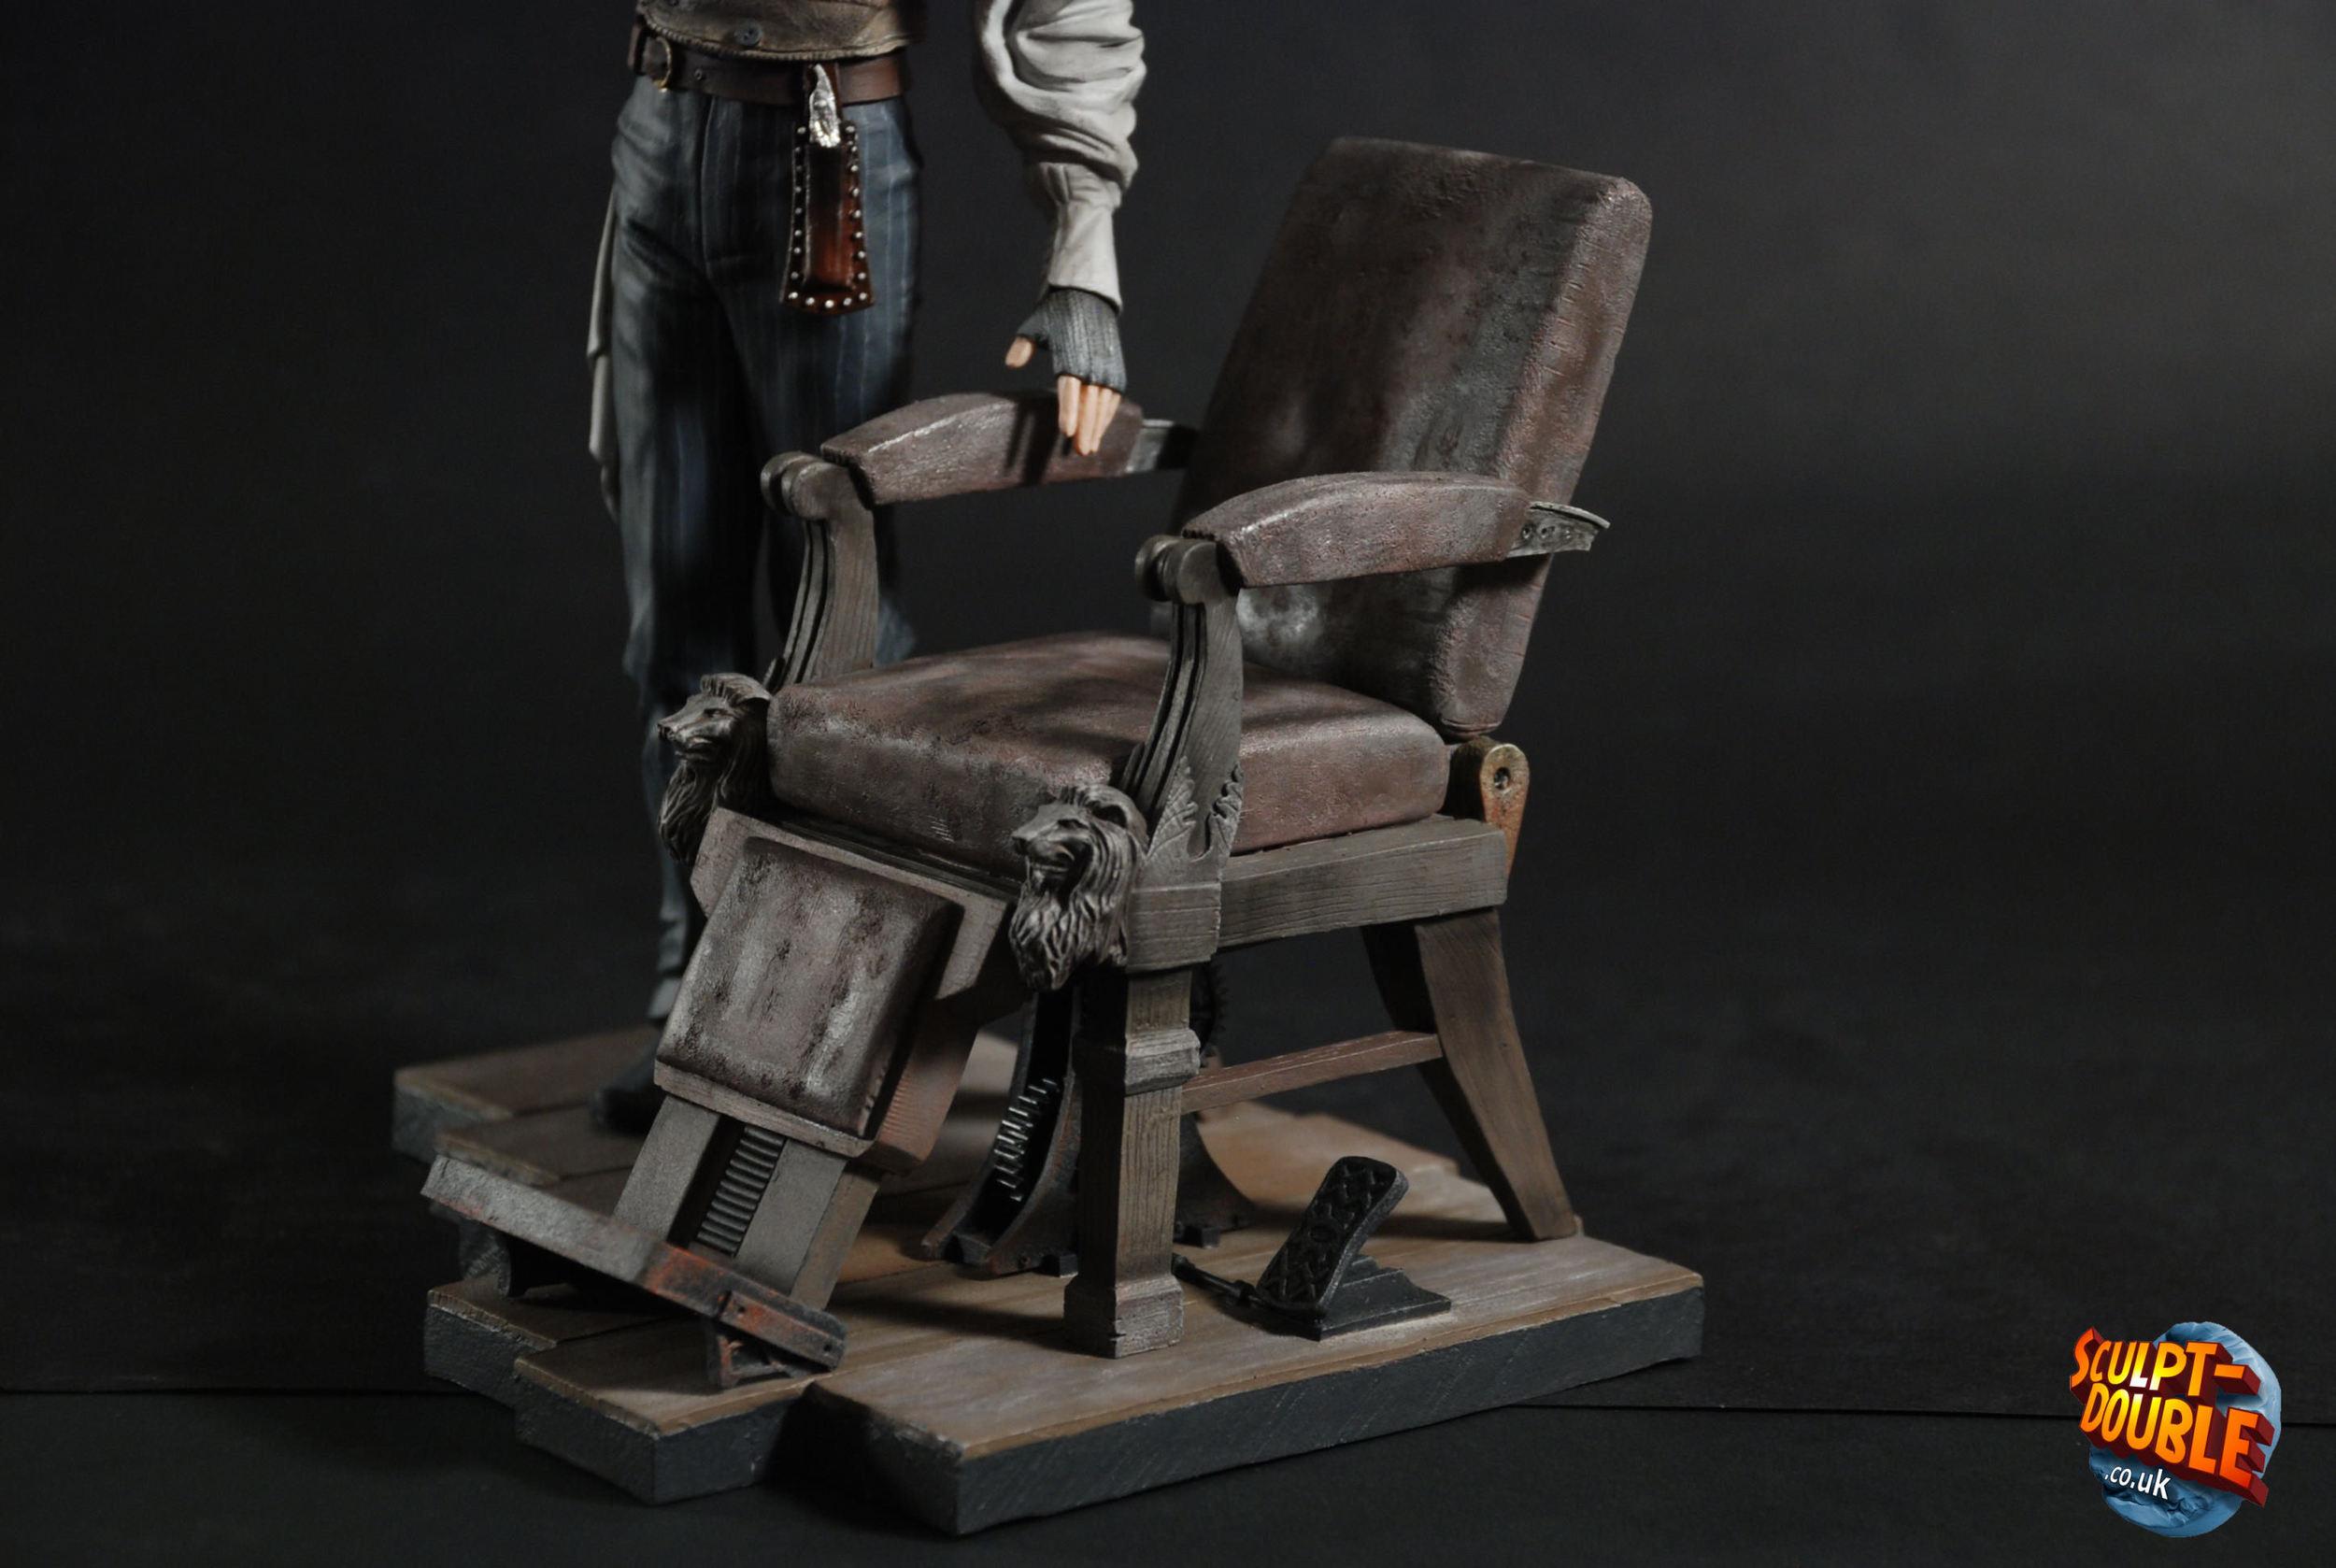 Sweeney Todd chair 01.jpg